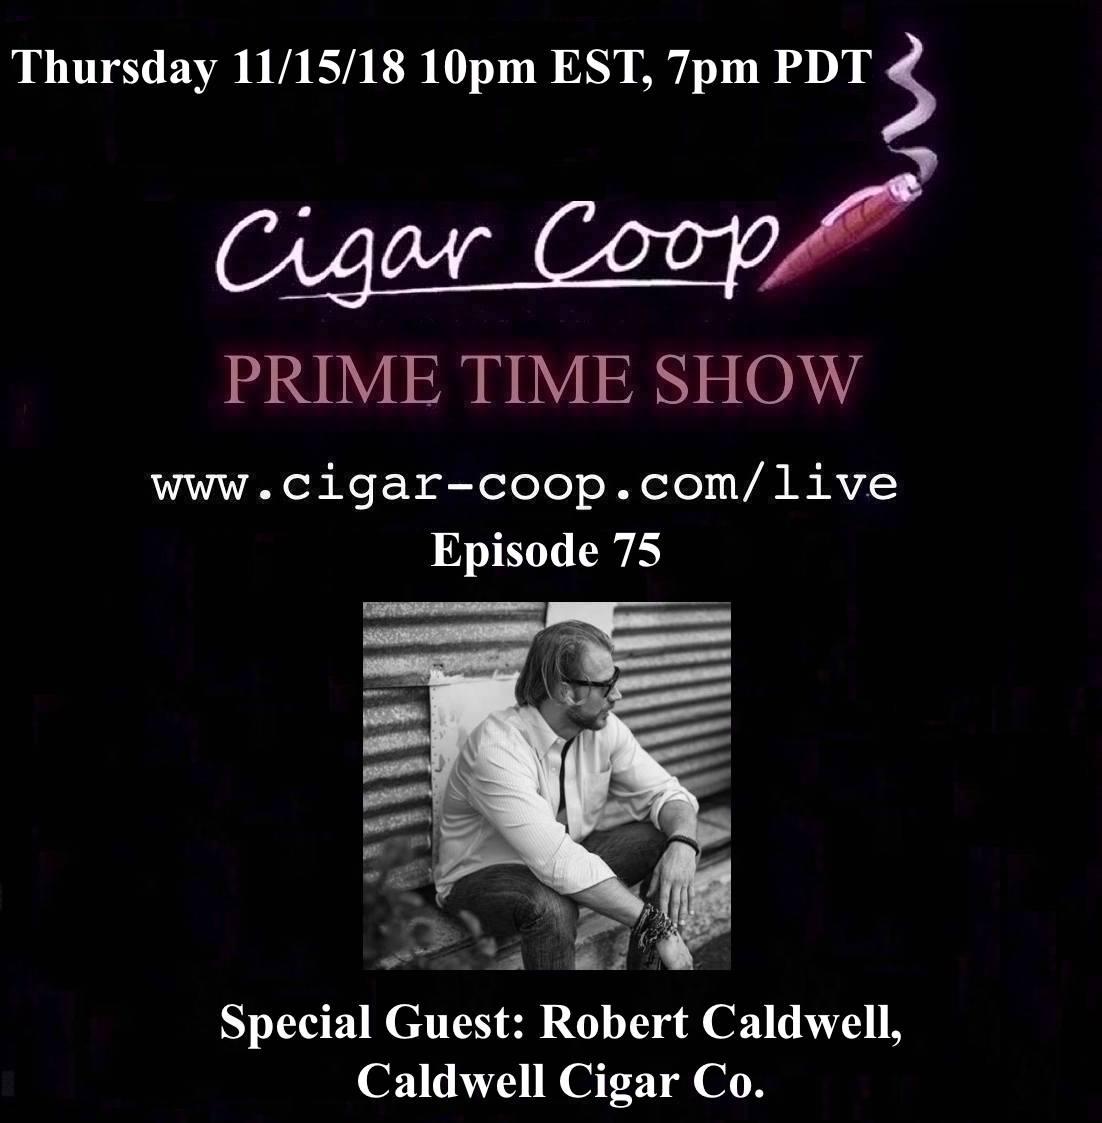 Announcement: Prime Time Episode 75 – Robert Caldwell, Caldwell Cigar Company 10pm EST 7pm CST